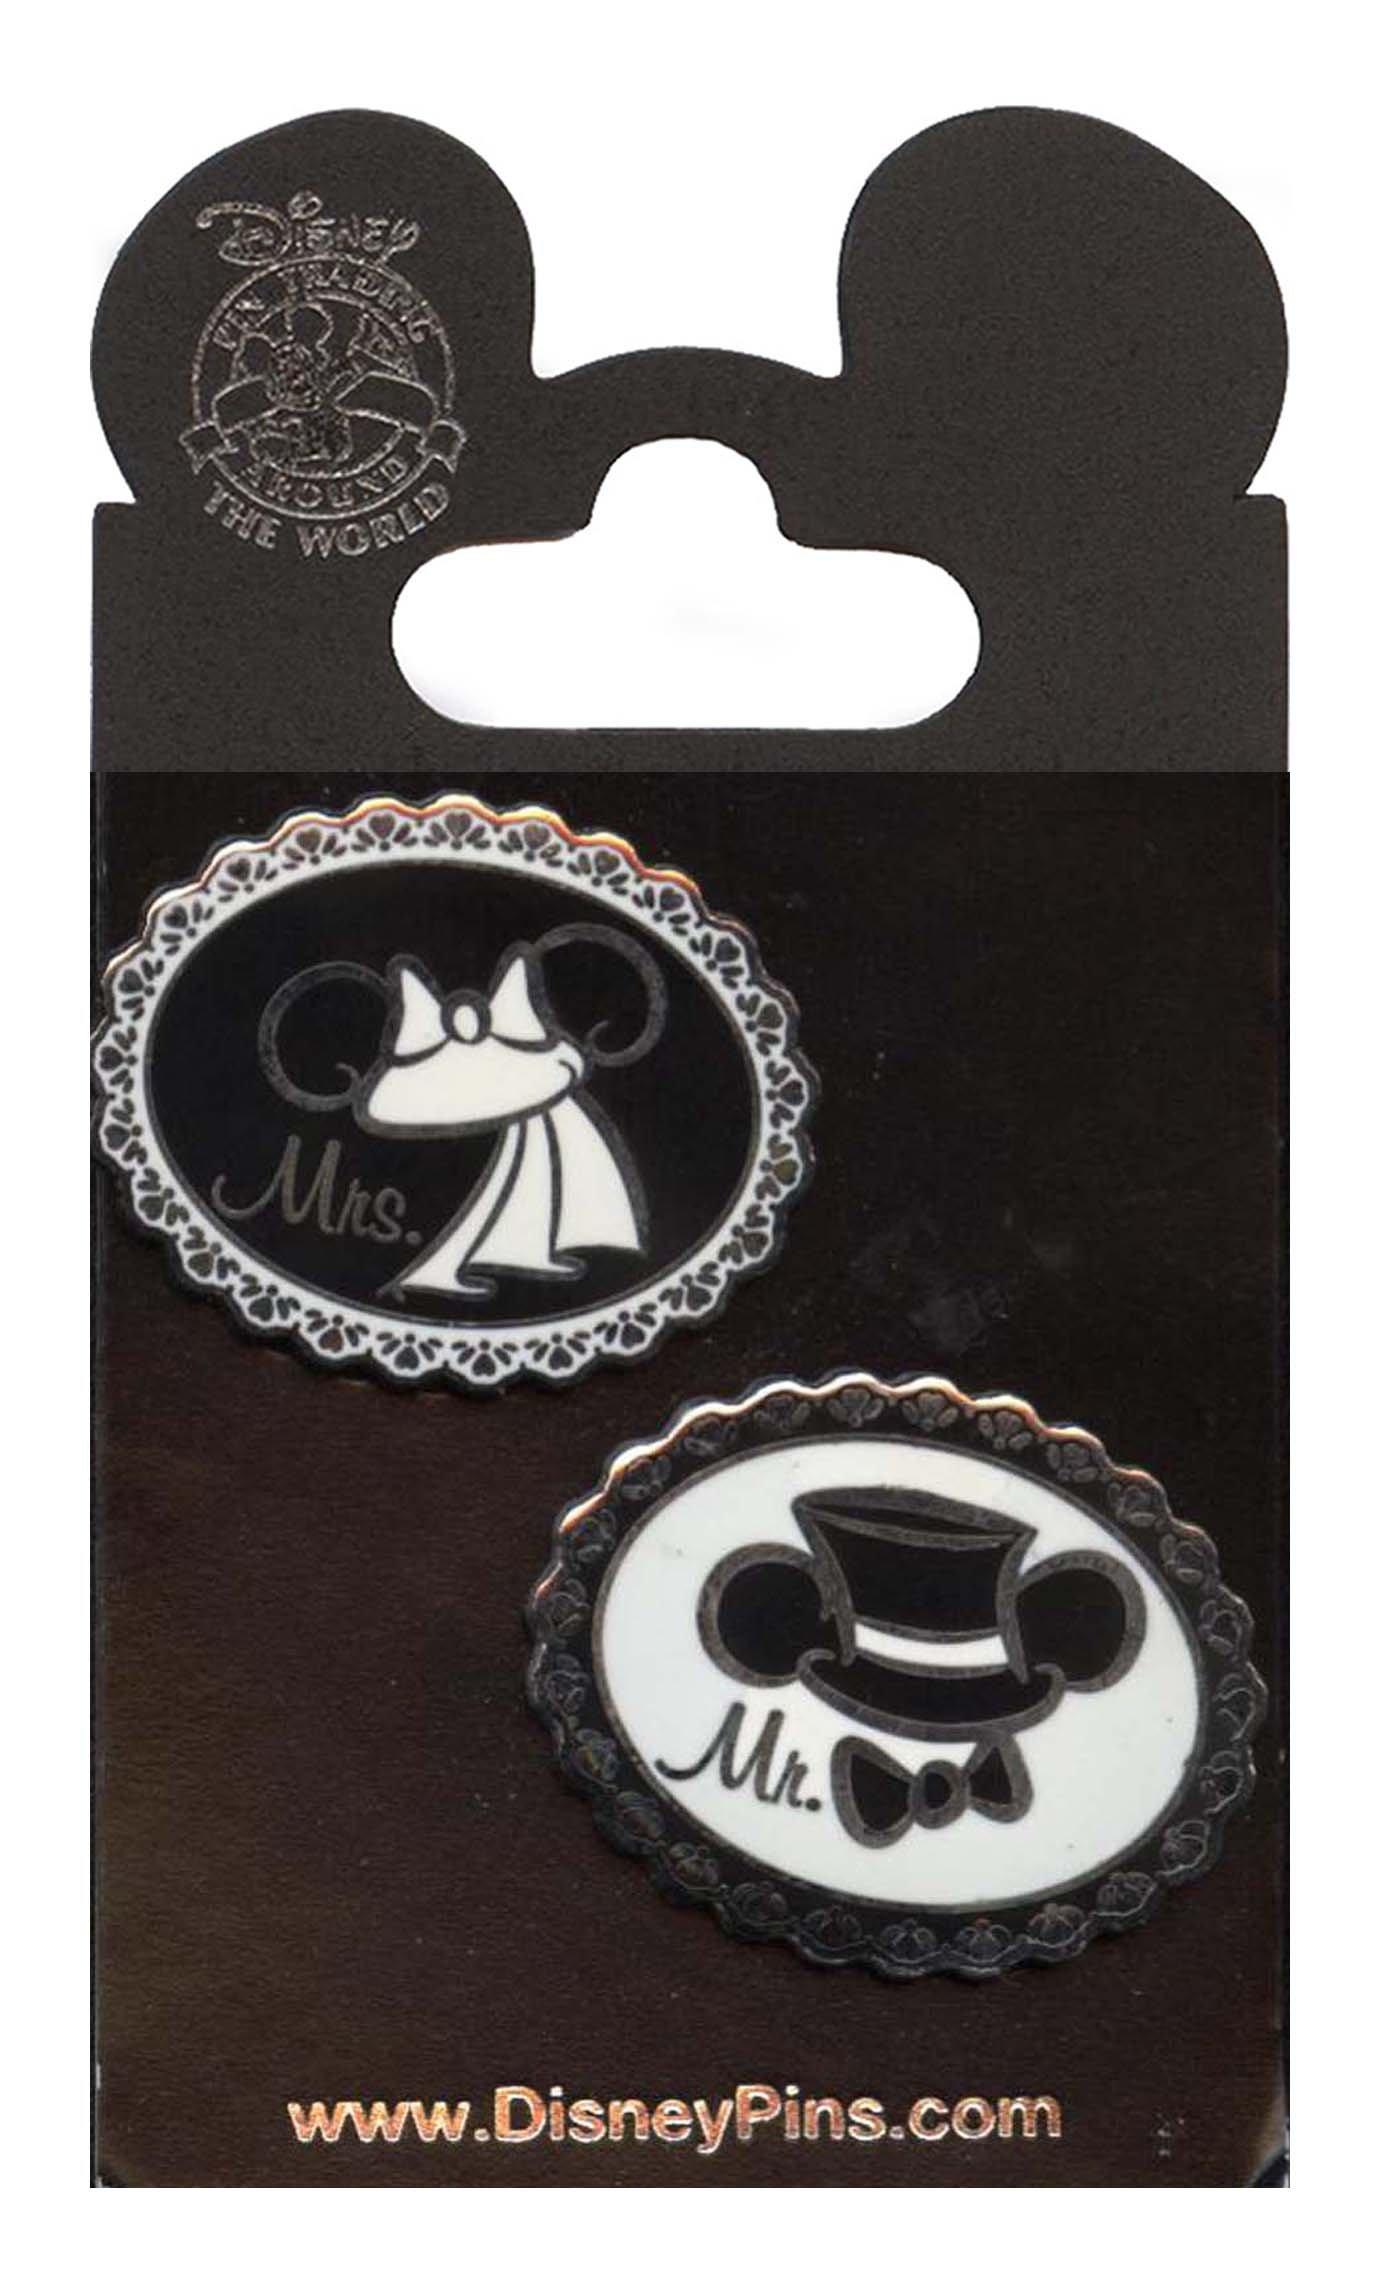 Disney Pins - Wedding Ear Hats - First Release - Pin 74249